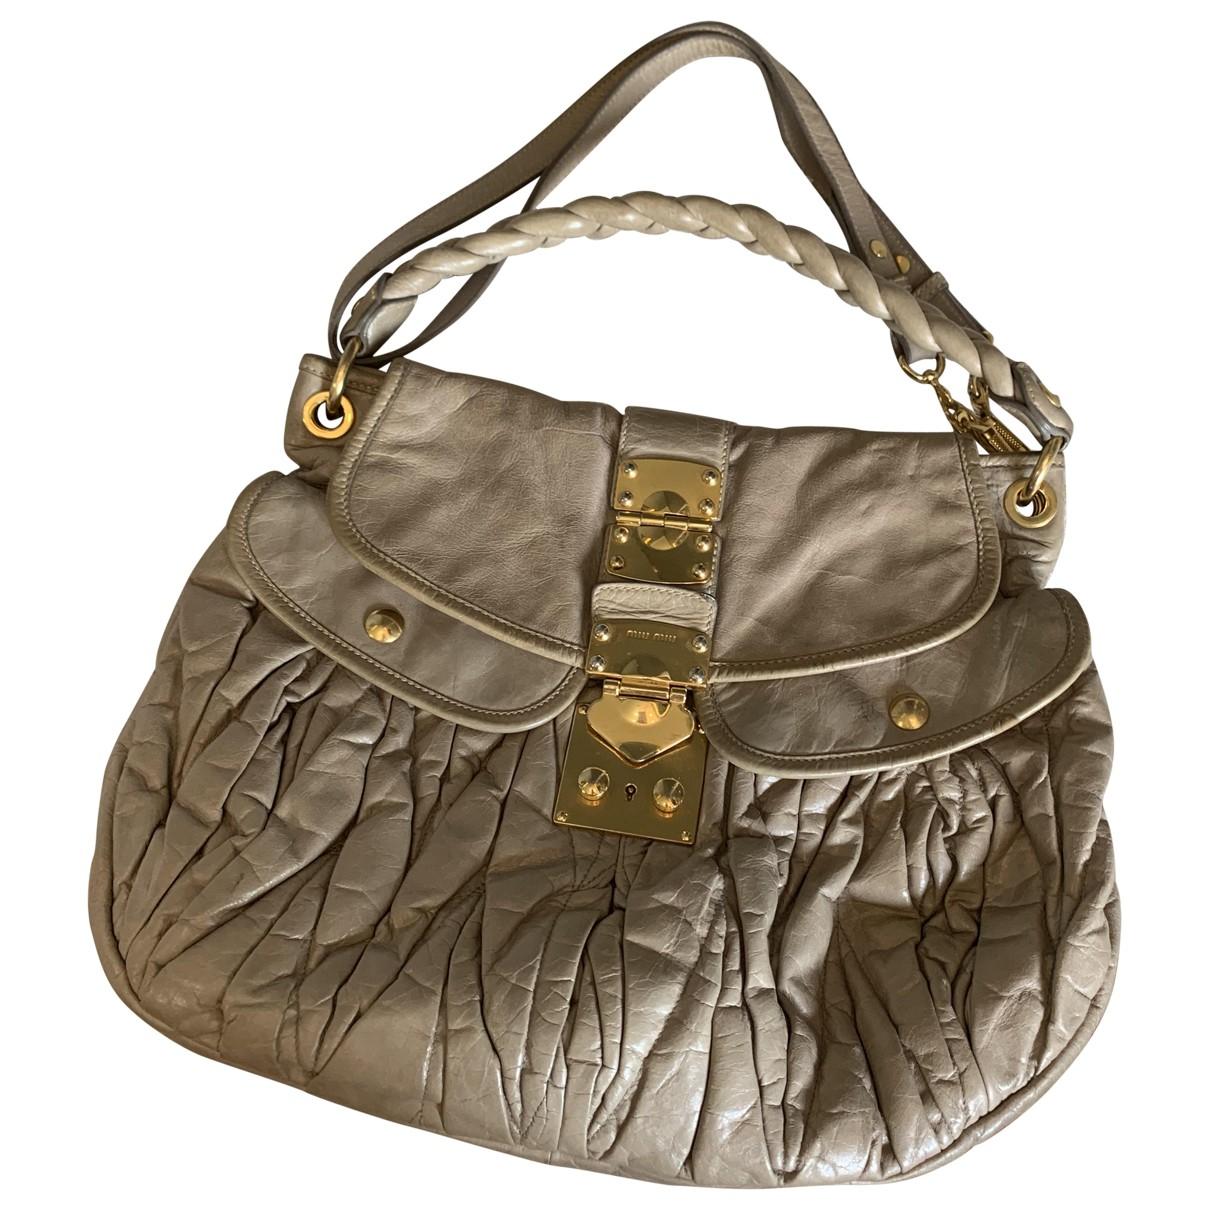 Miu Miu Matelassé Beige Leather handbag for Women \N